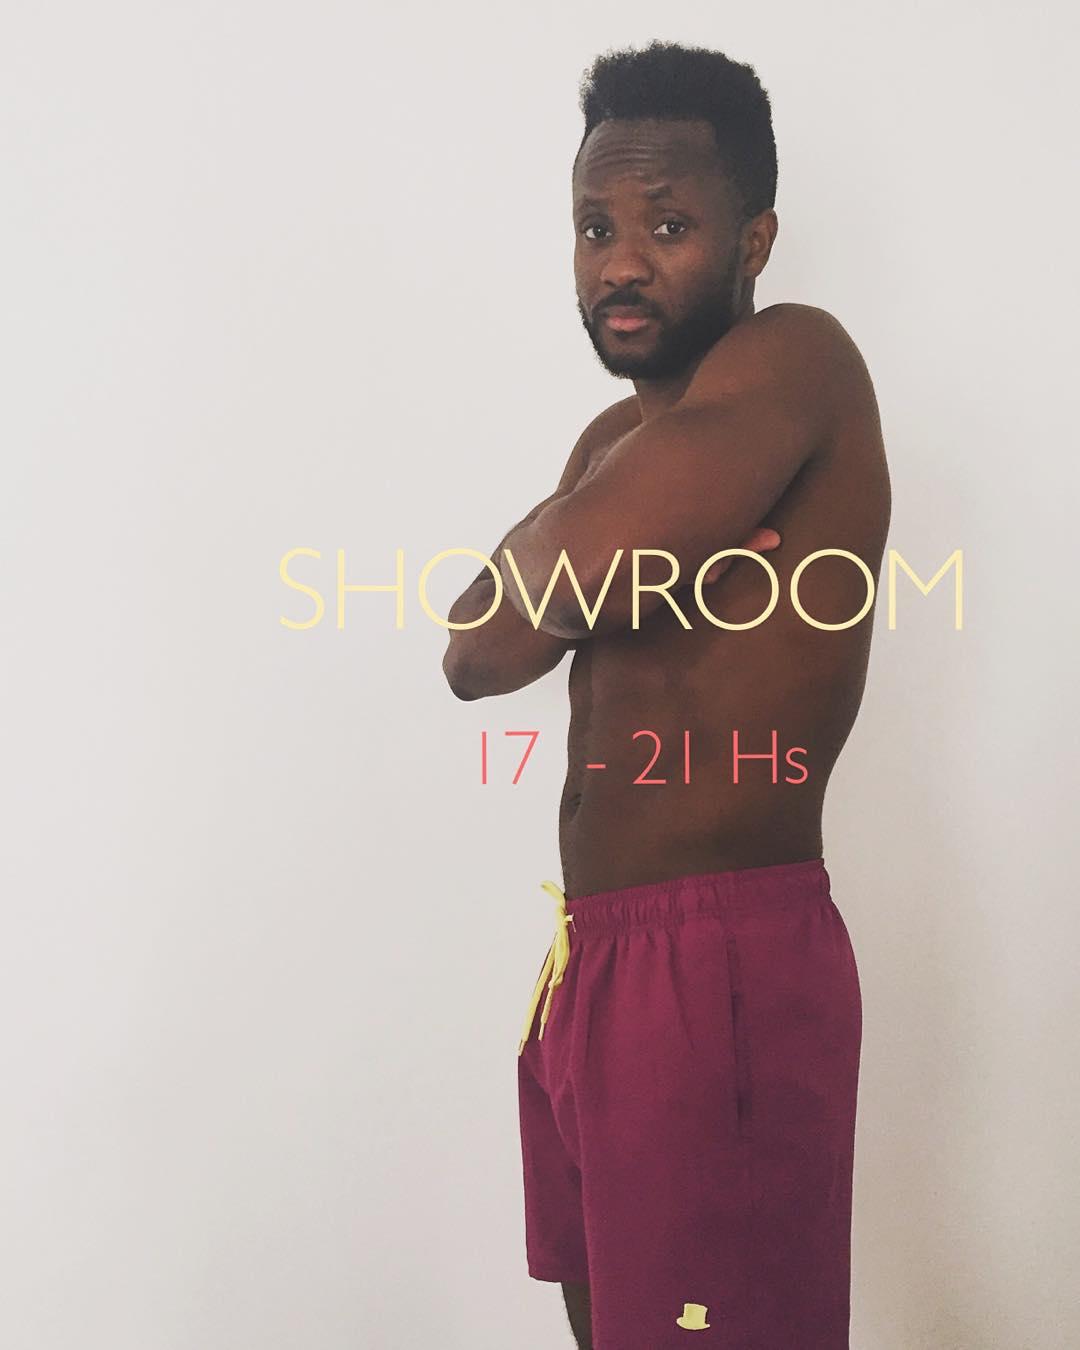 ⚡️HOY SHOWROOM RECOLETA⚡️ MAR-VIE 17-21Hs